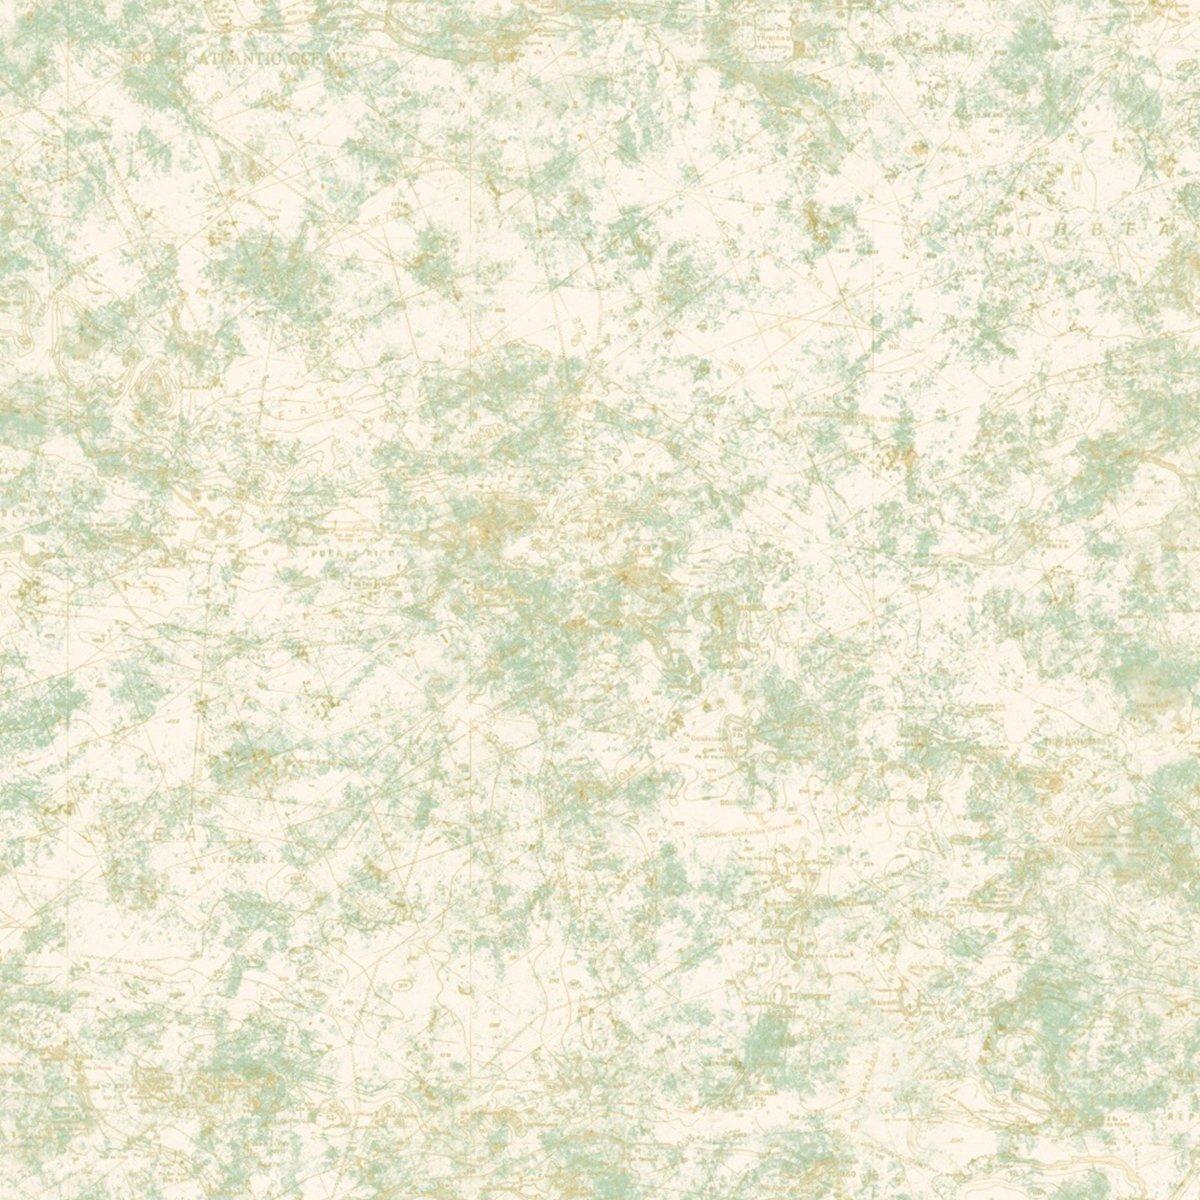 Map Giấy Dán Tường Texture Happy Story 6800-1B